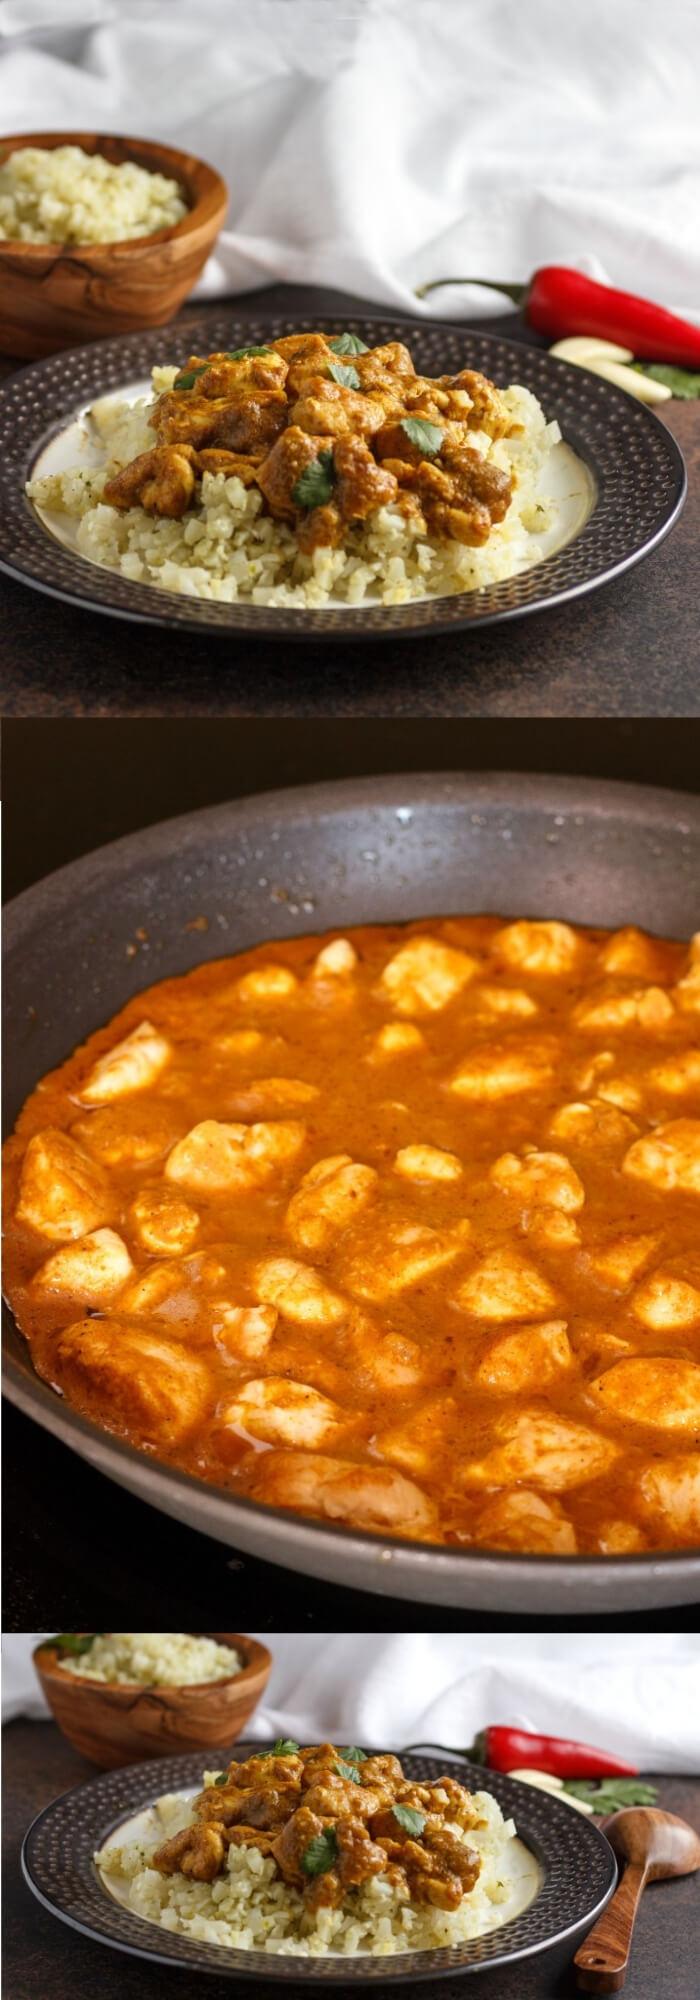 Keto Breakfast Indian - Chicken Korma